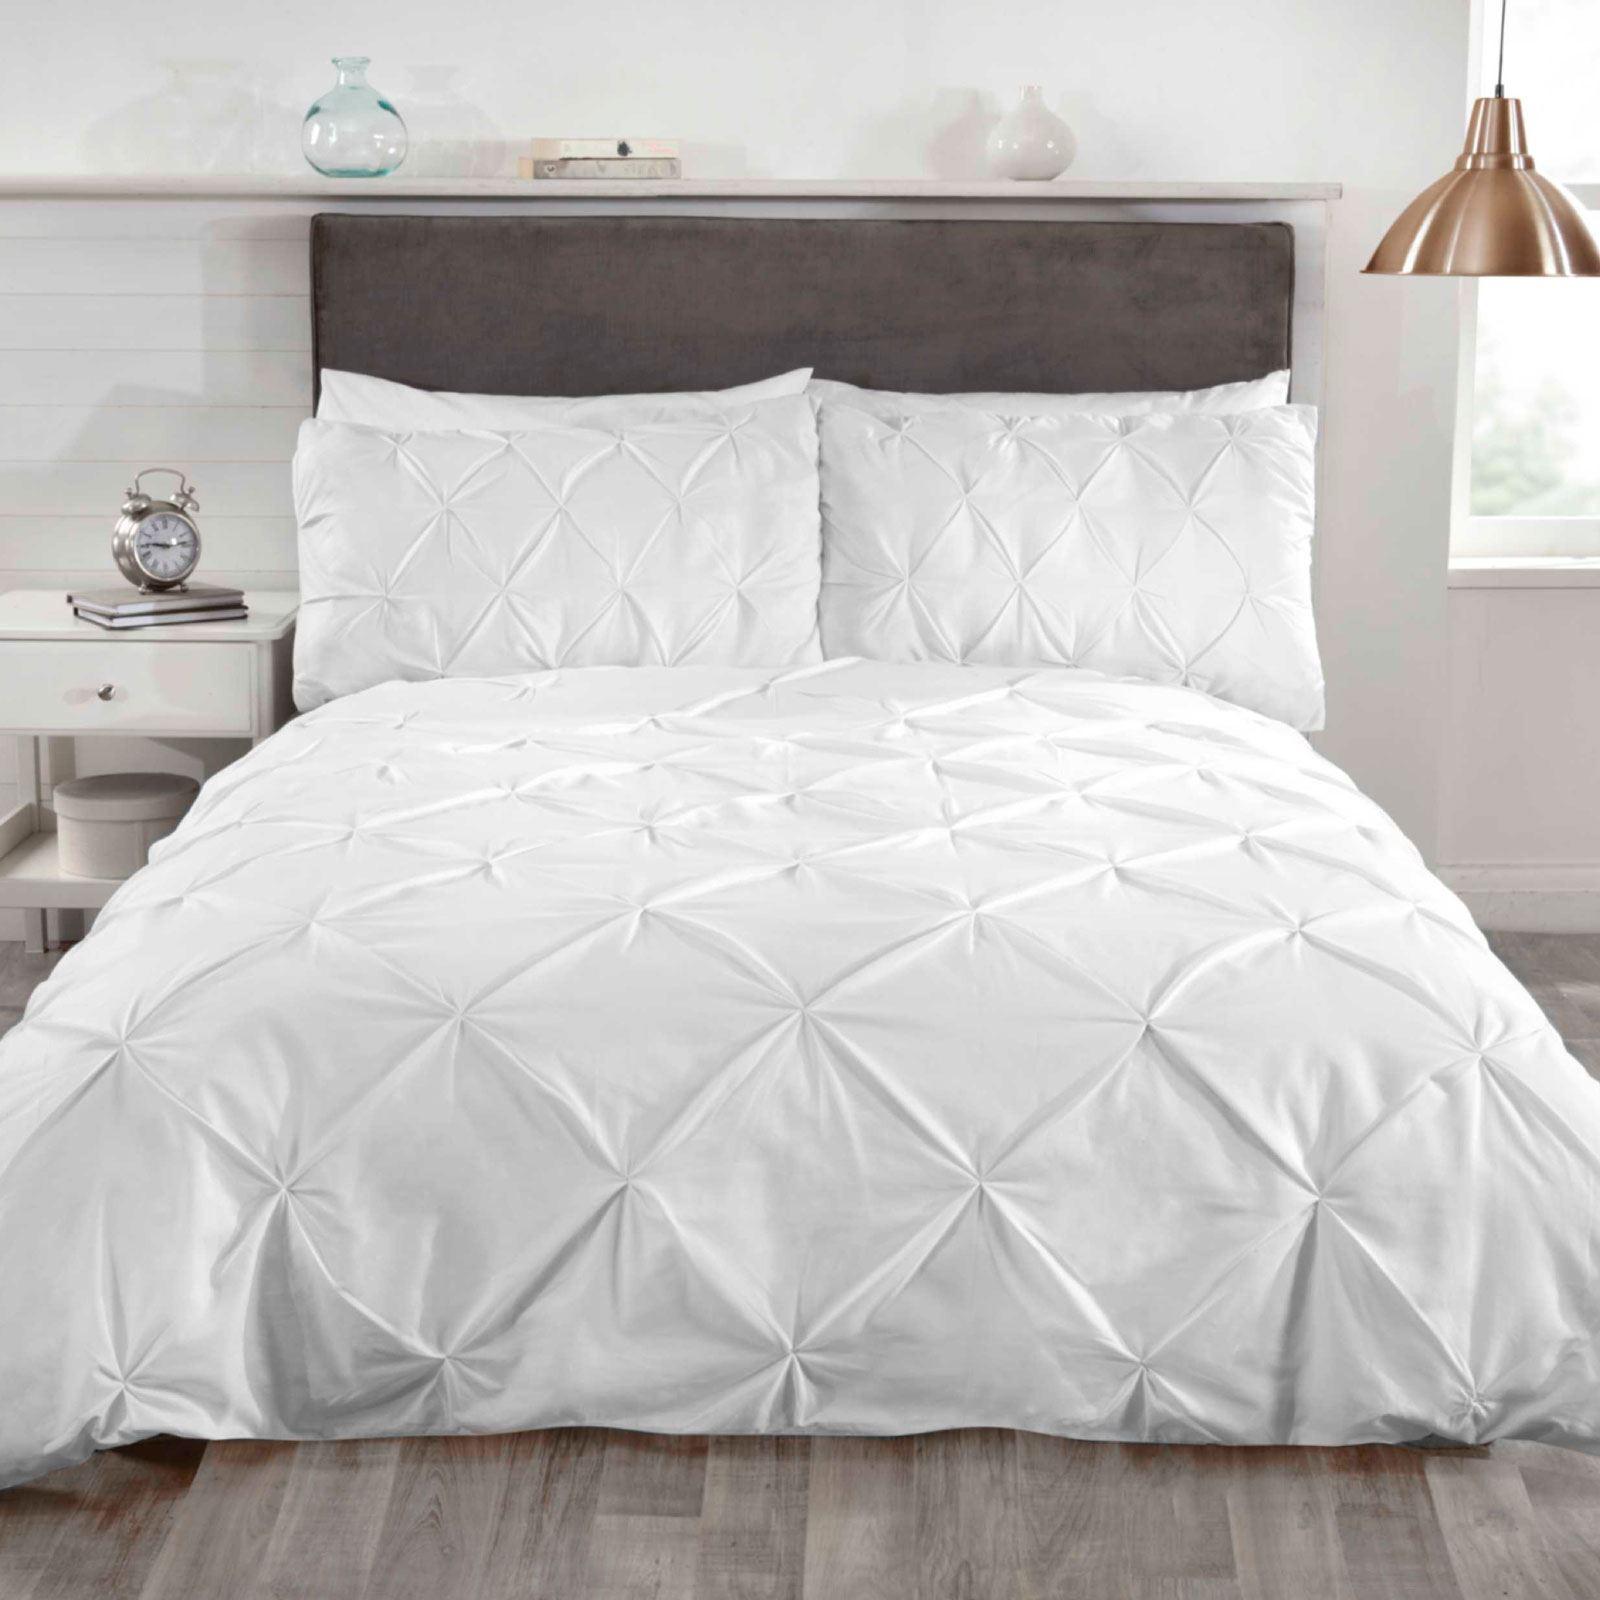 Balmoral Pin Tuck White King Size Duvet Cover Set Luxury Bedding